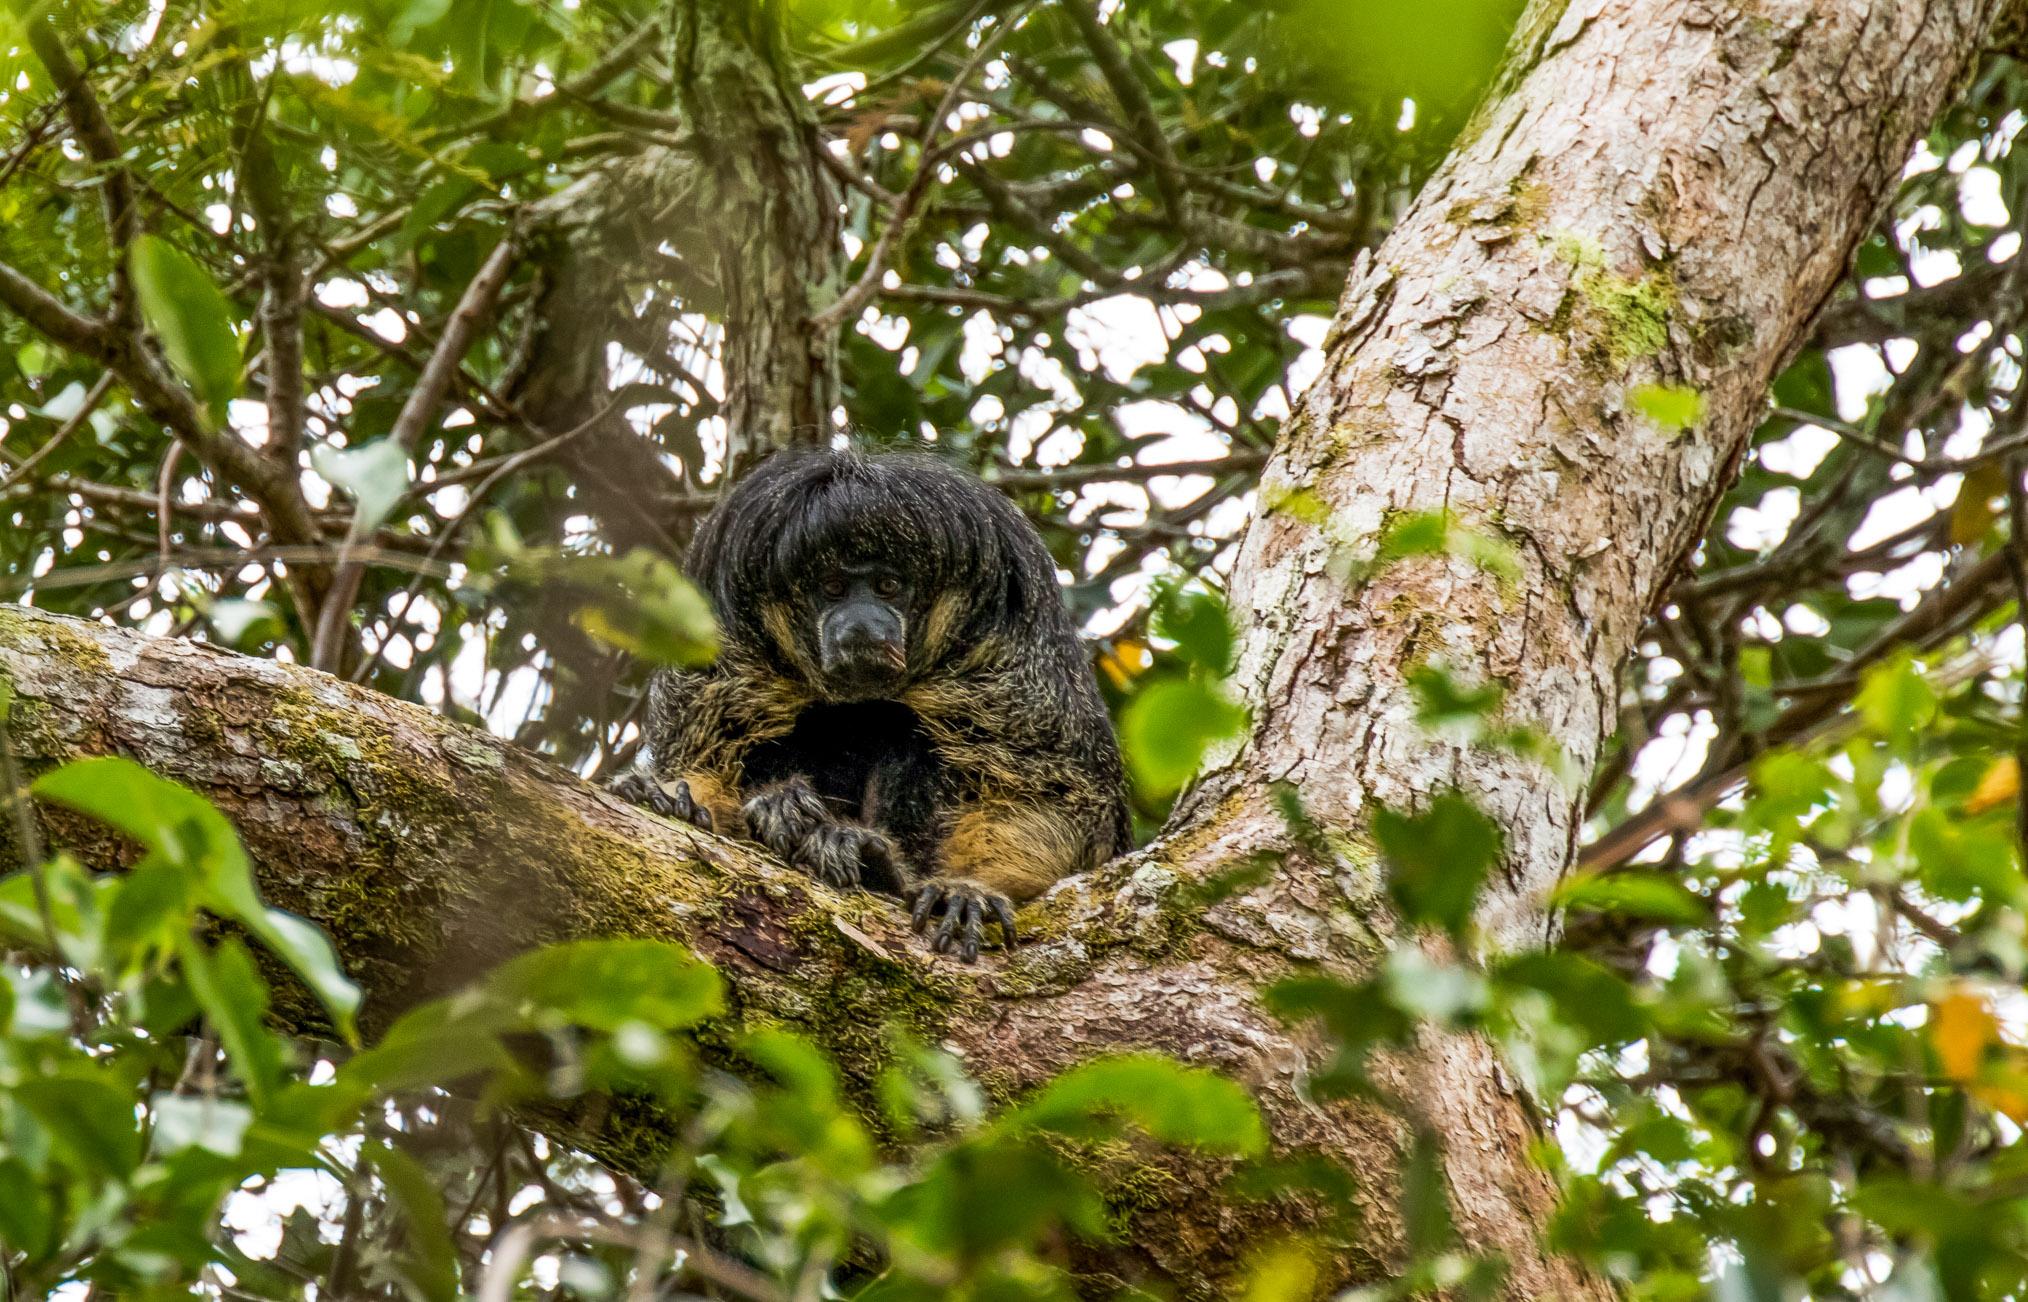 A female Vanzolini saki monkey settles in to watch the researchers.